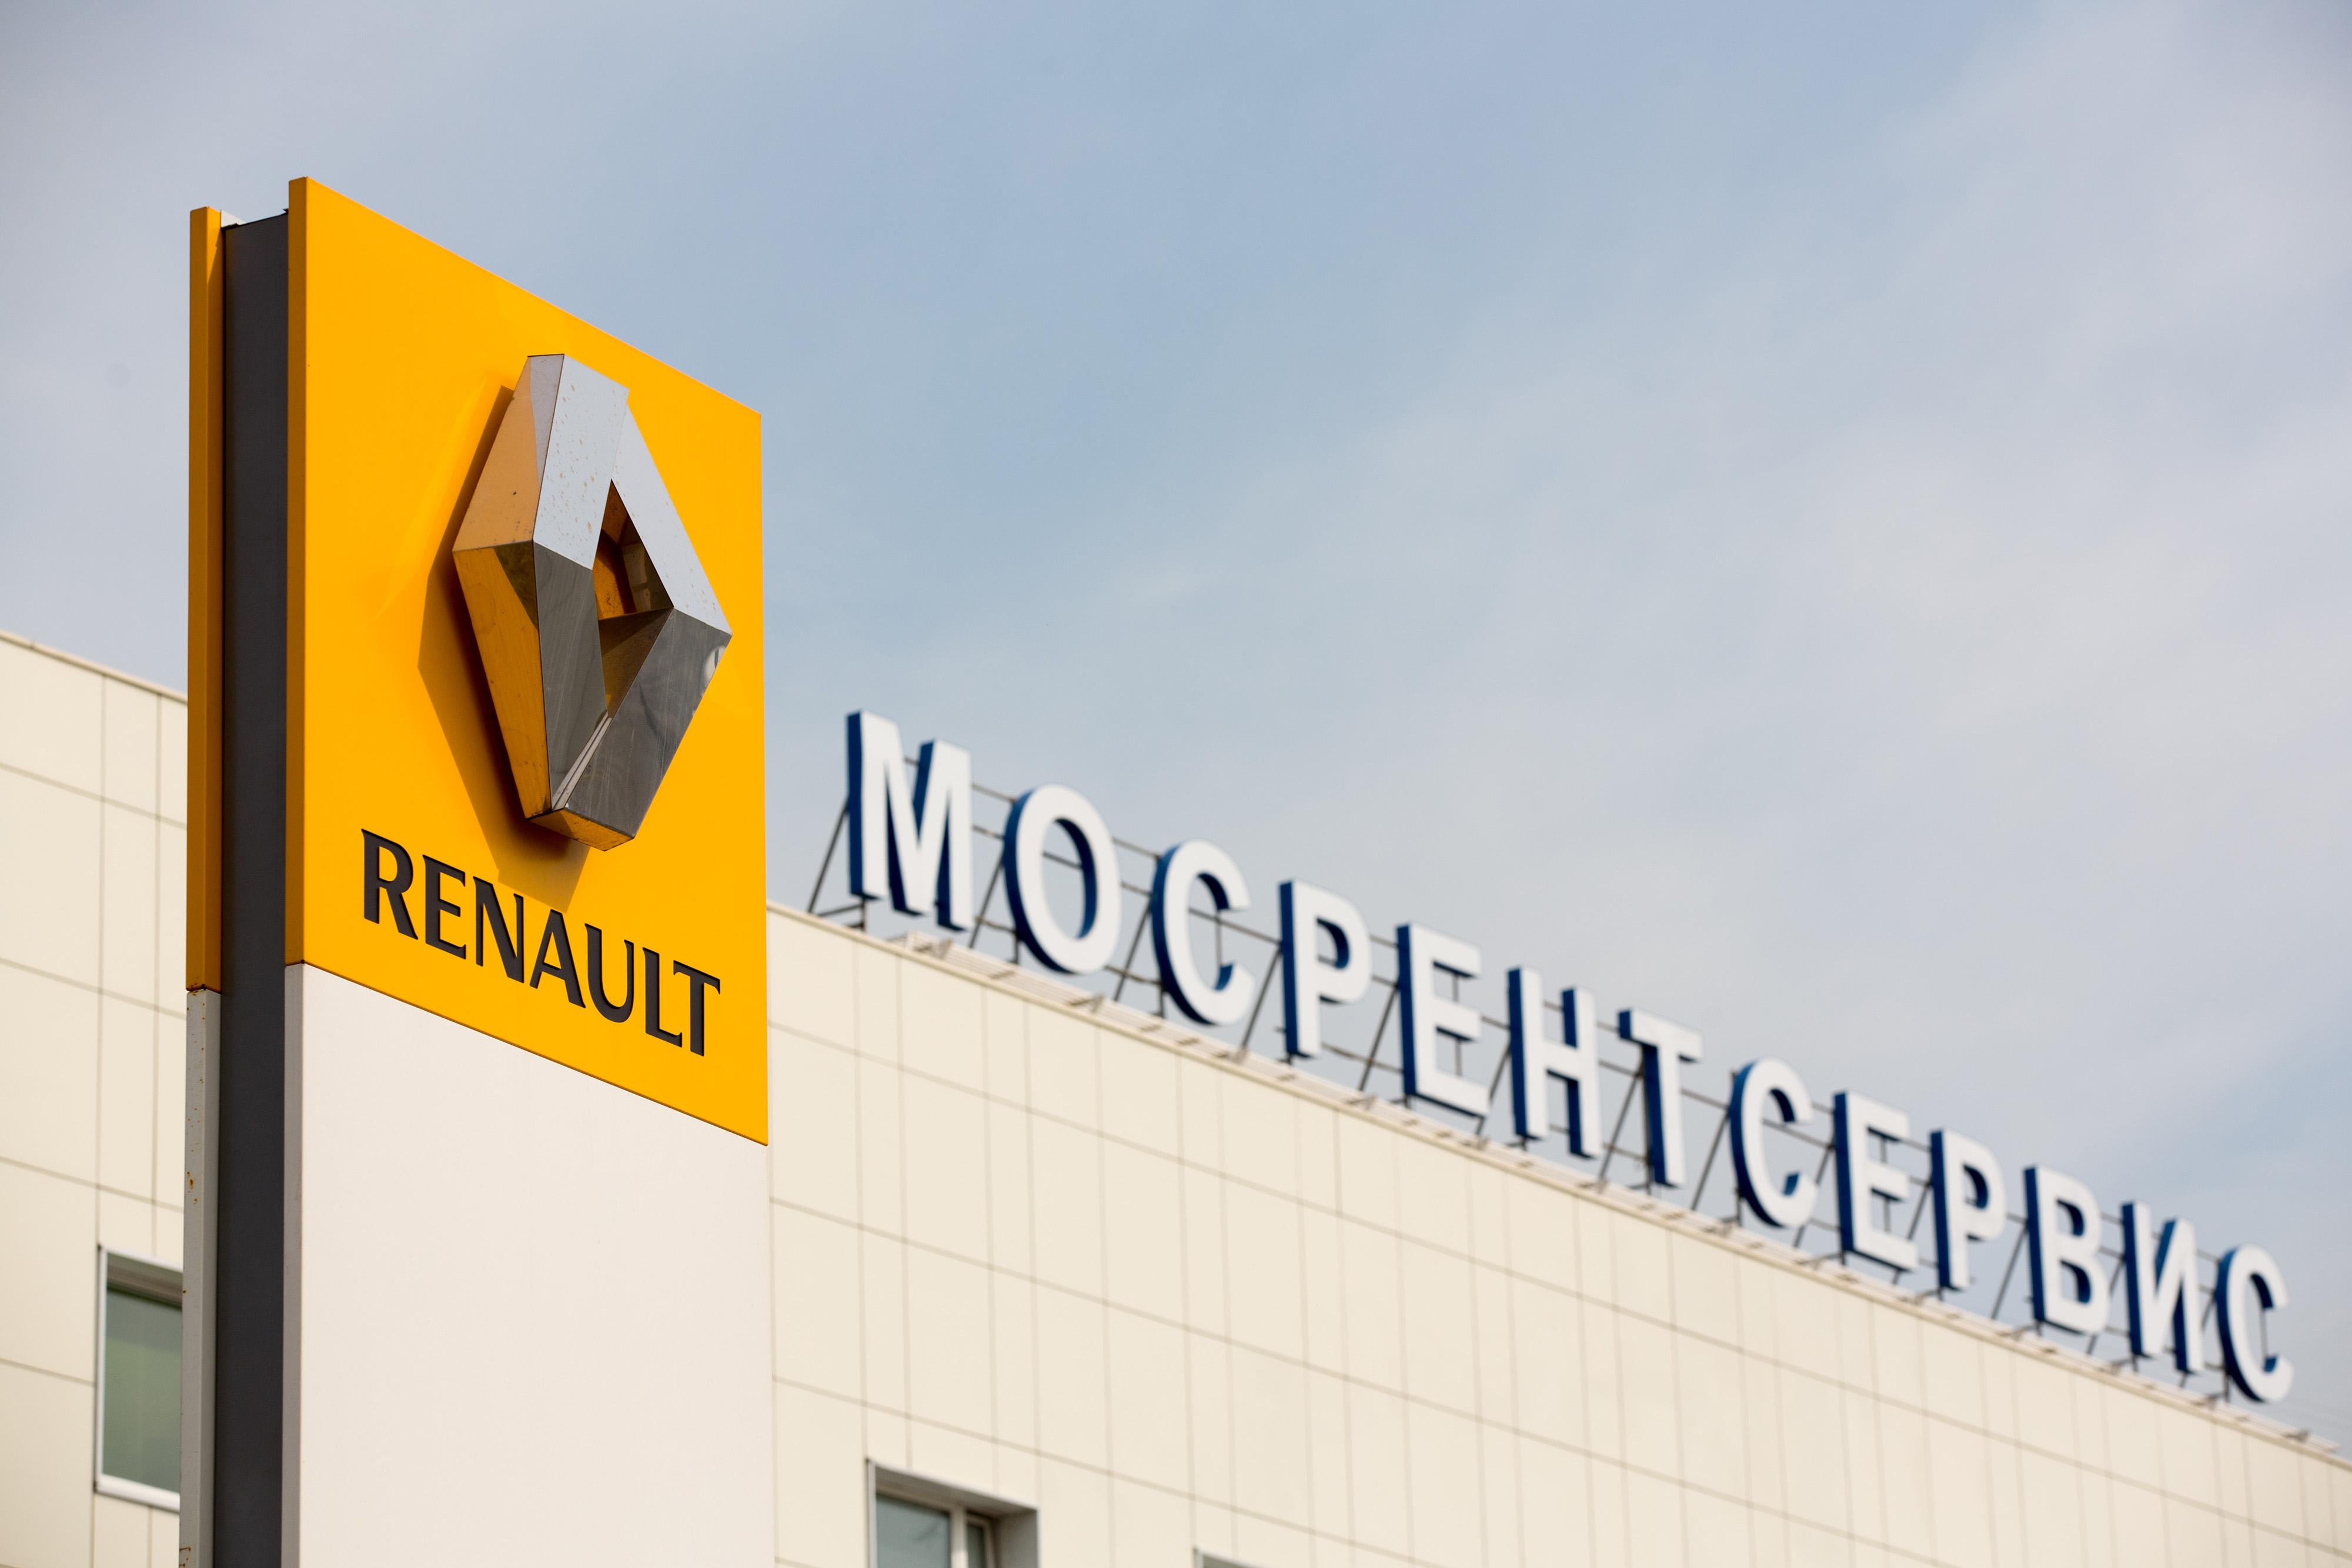 European Automobile Dealerships As Ukraine Crisis Affects Russian Vehicle Market